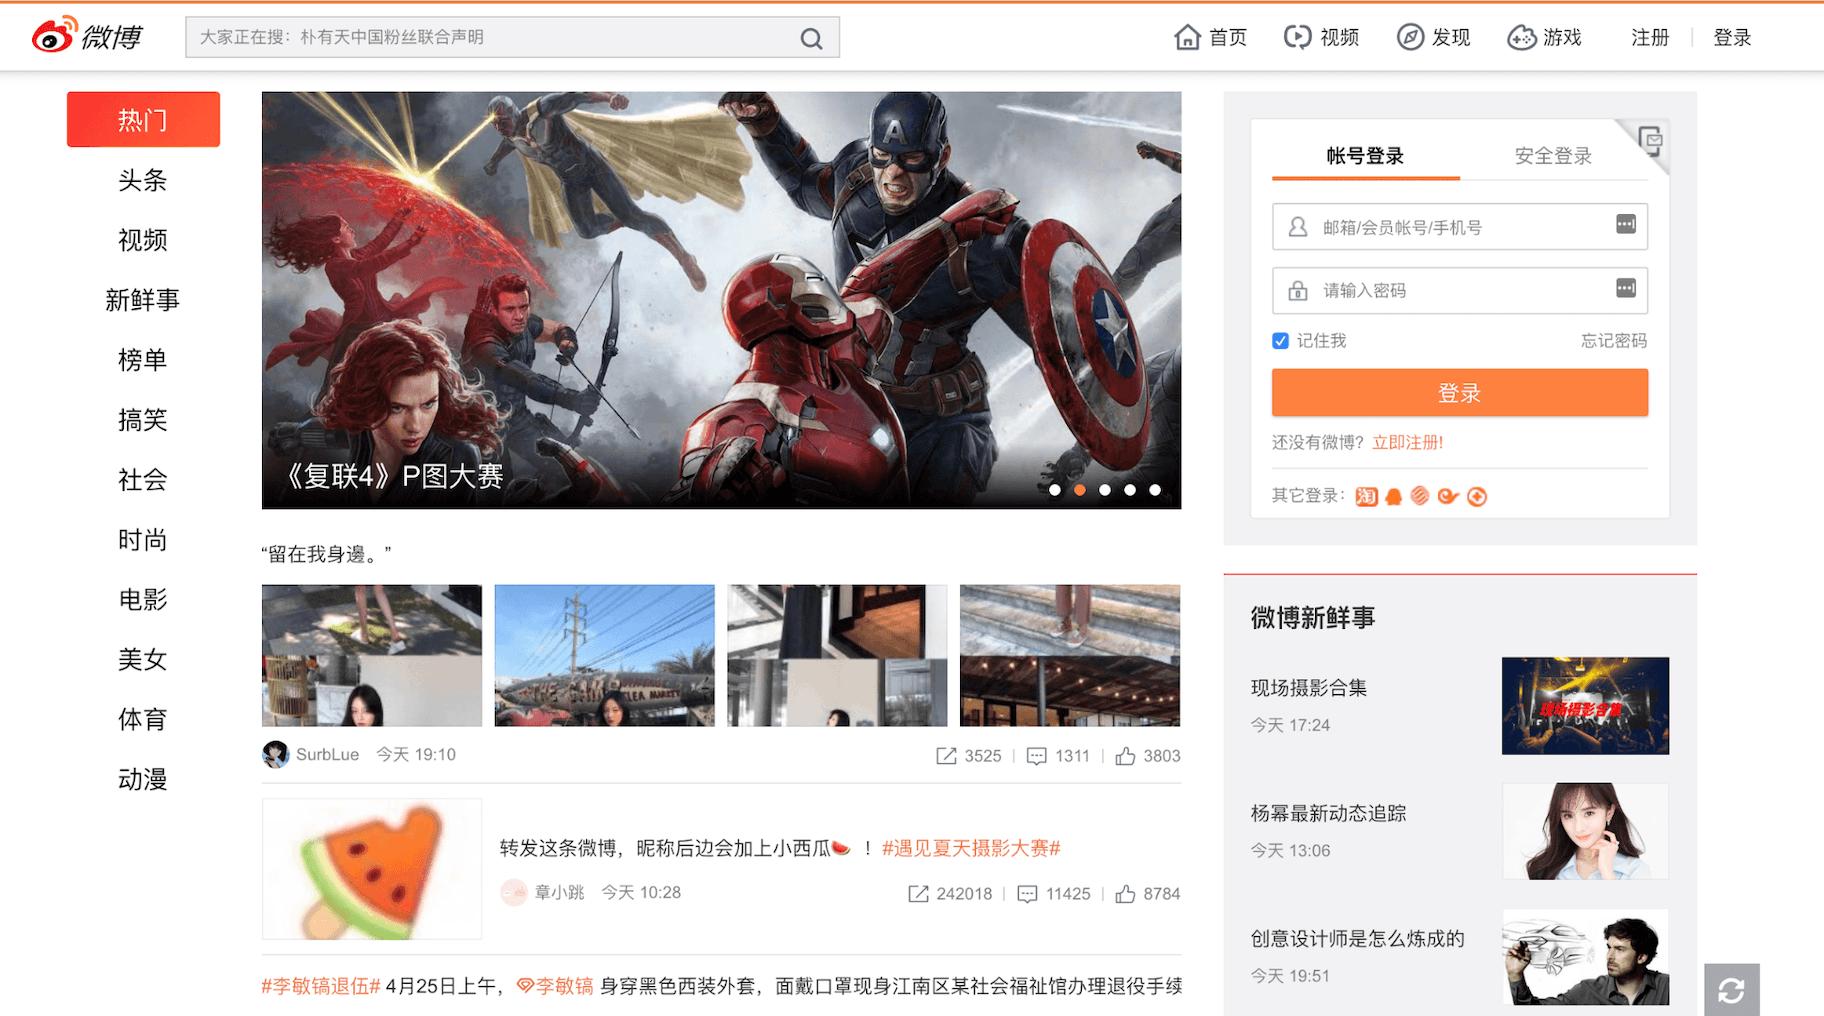 Sina Weibo Social Media Sites